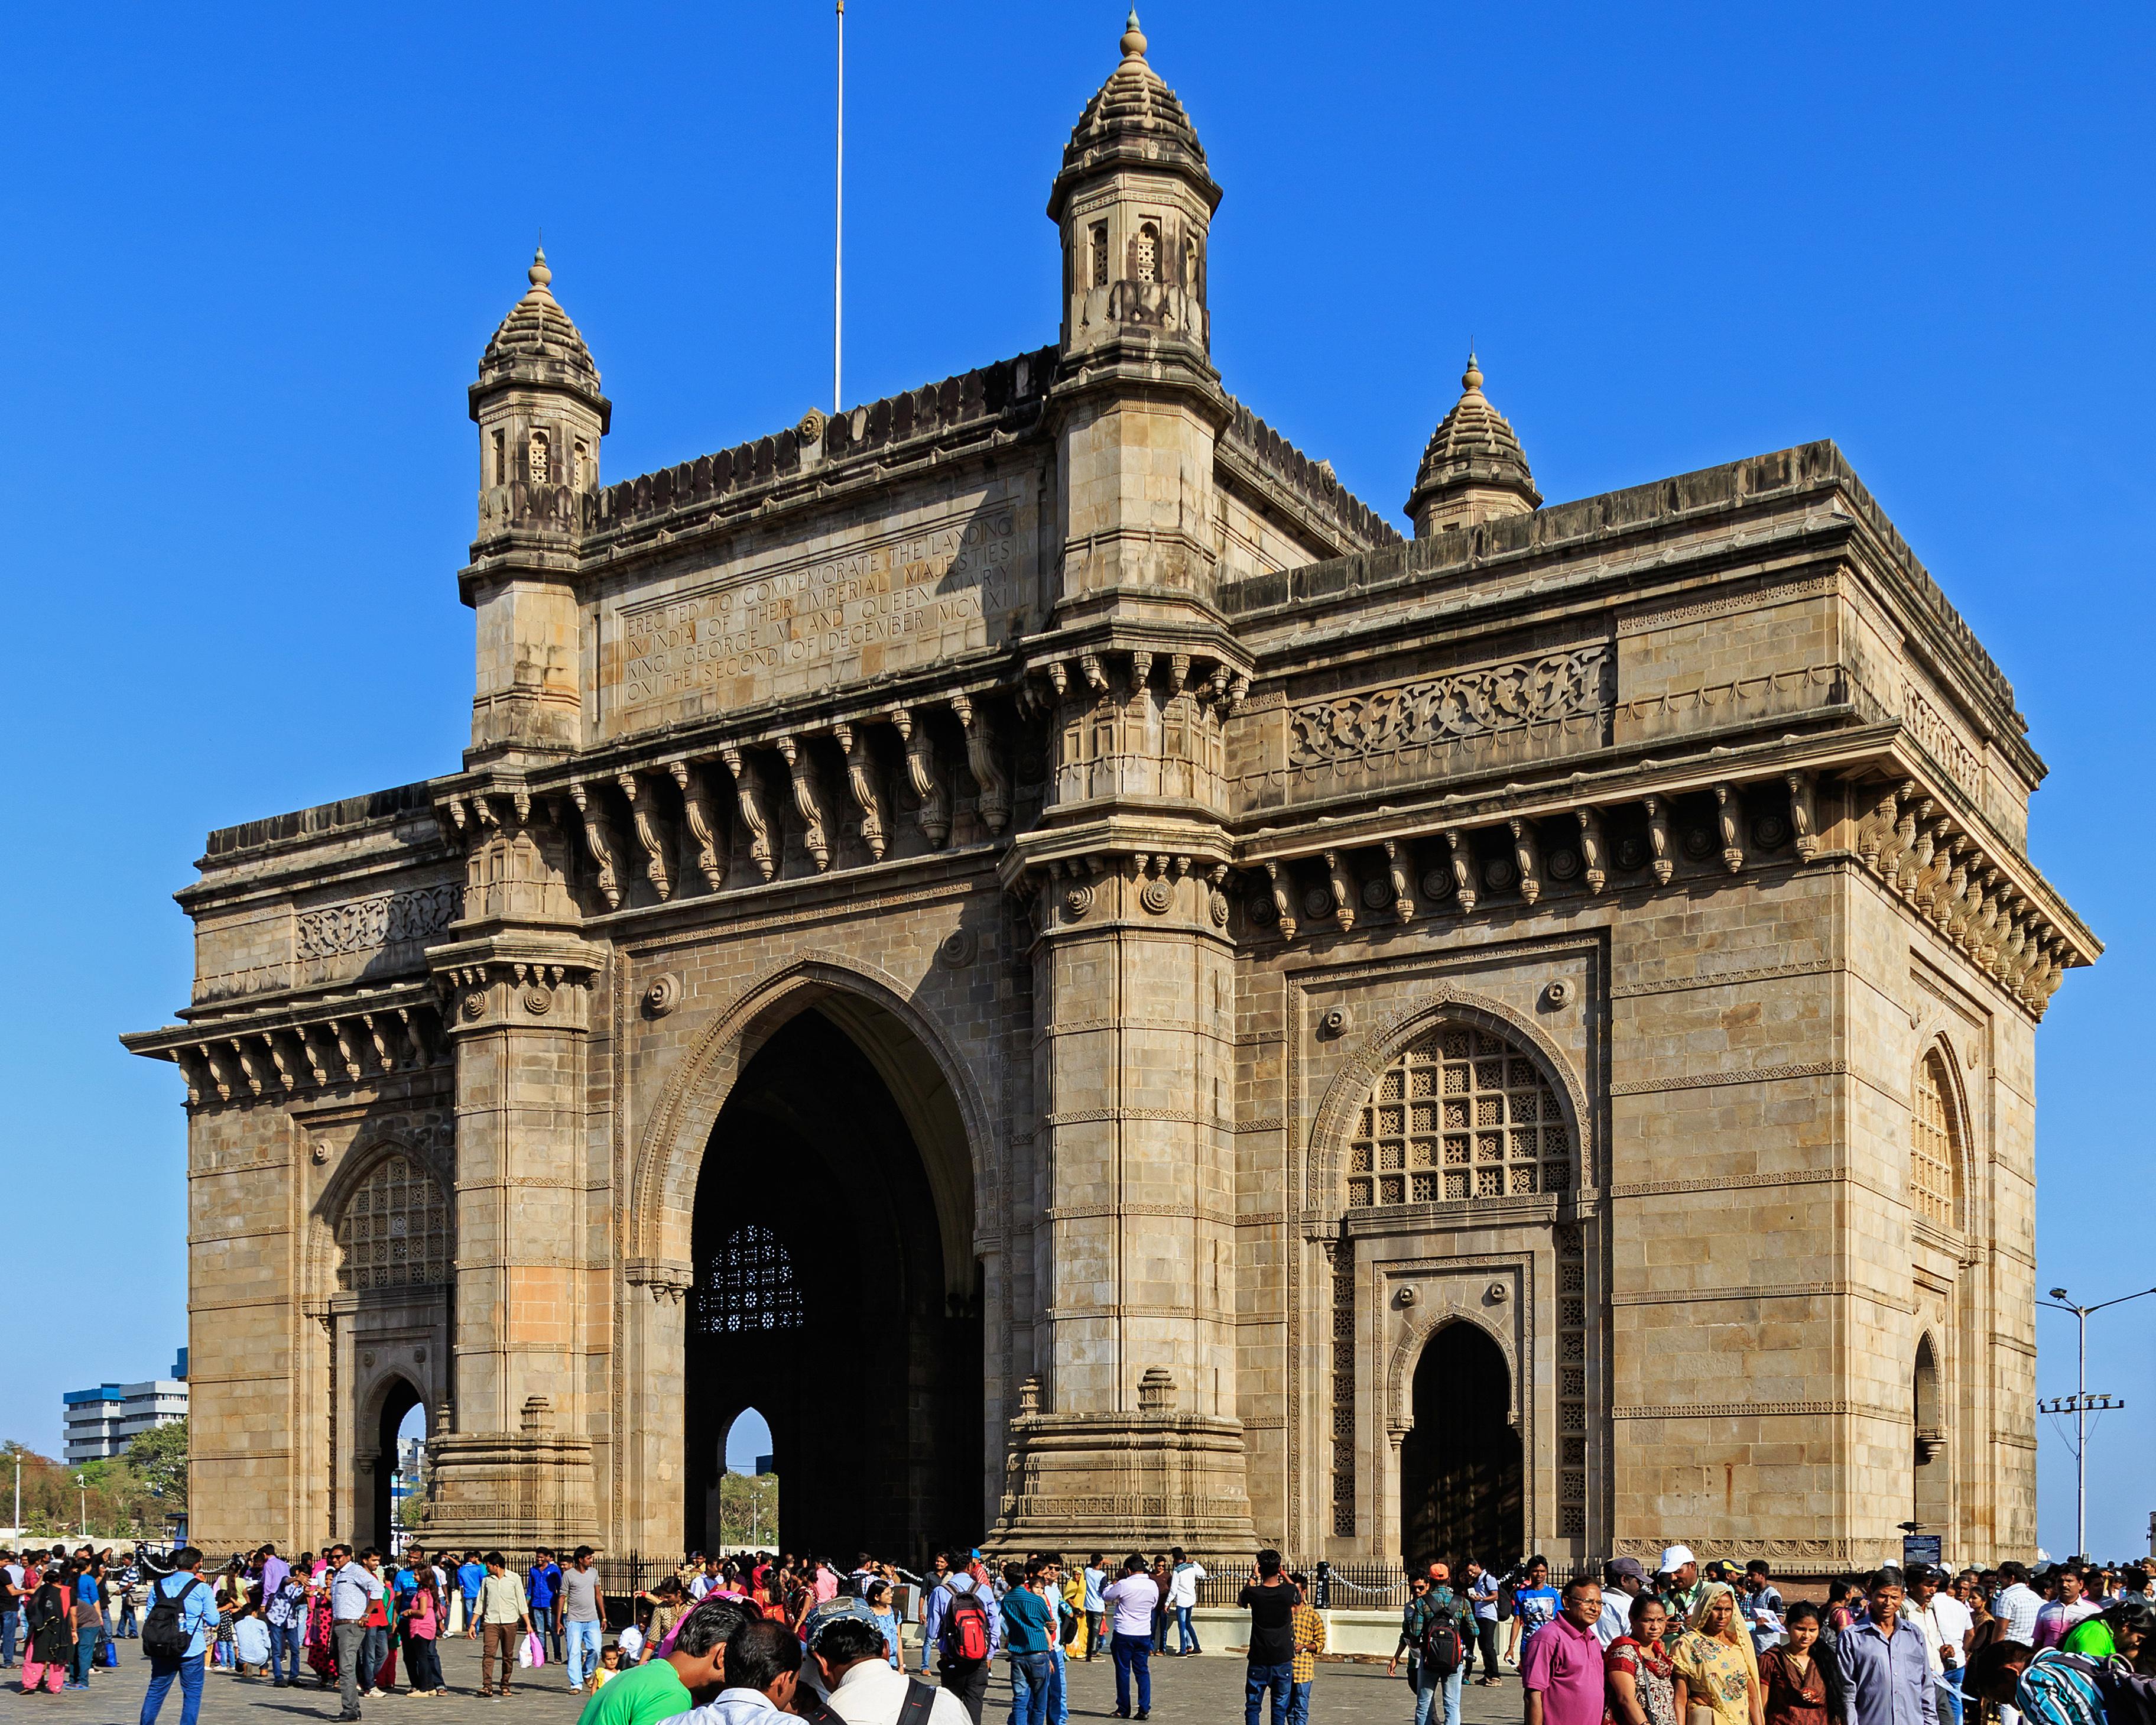 gateway of india mumbai - photo #12